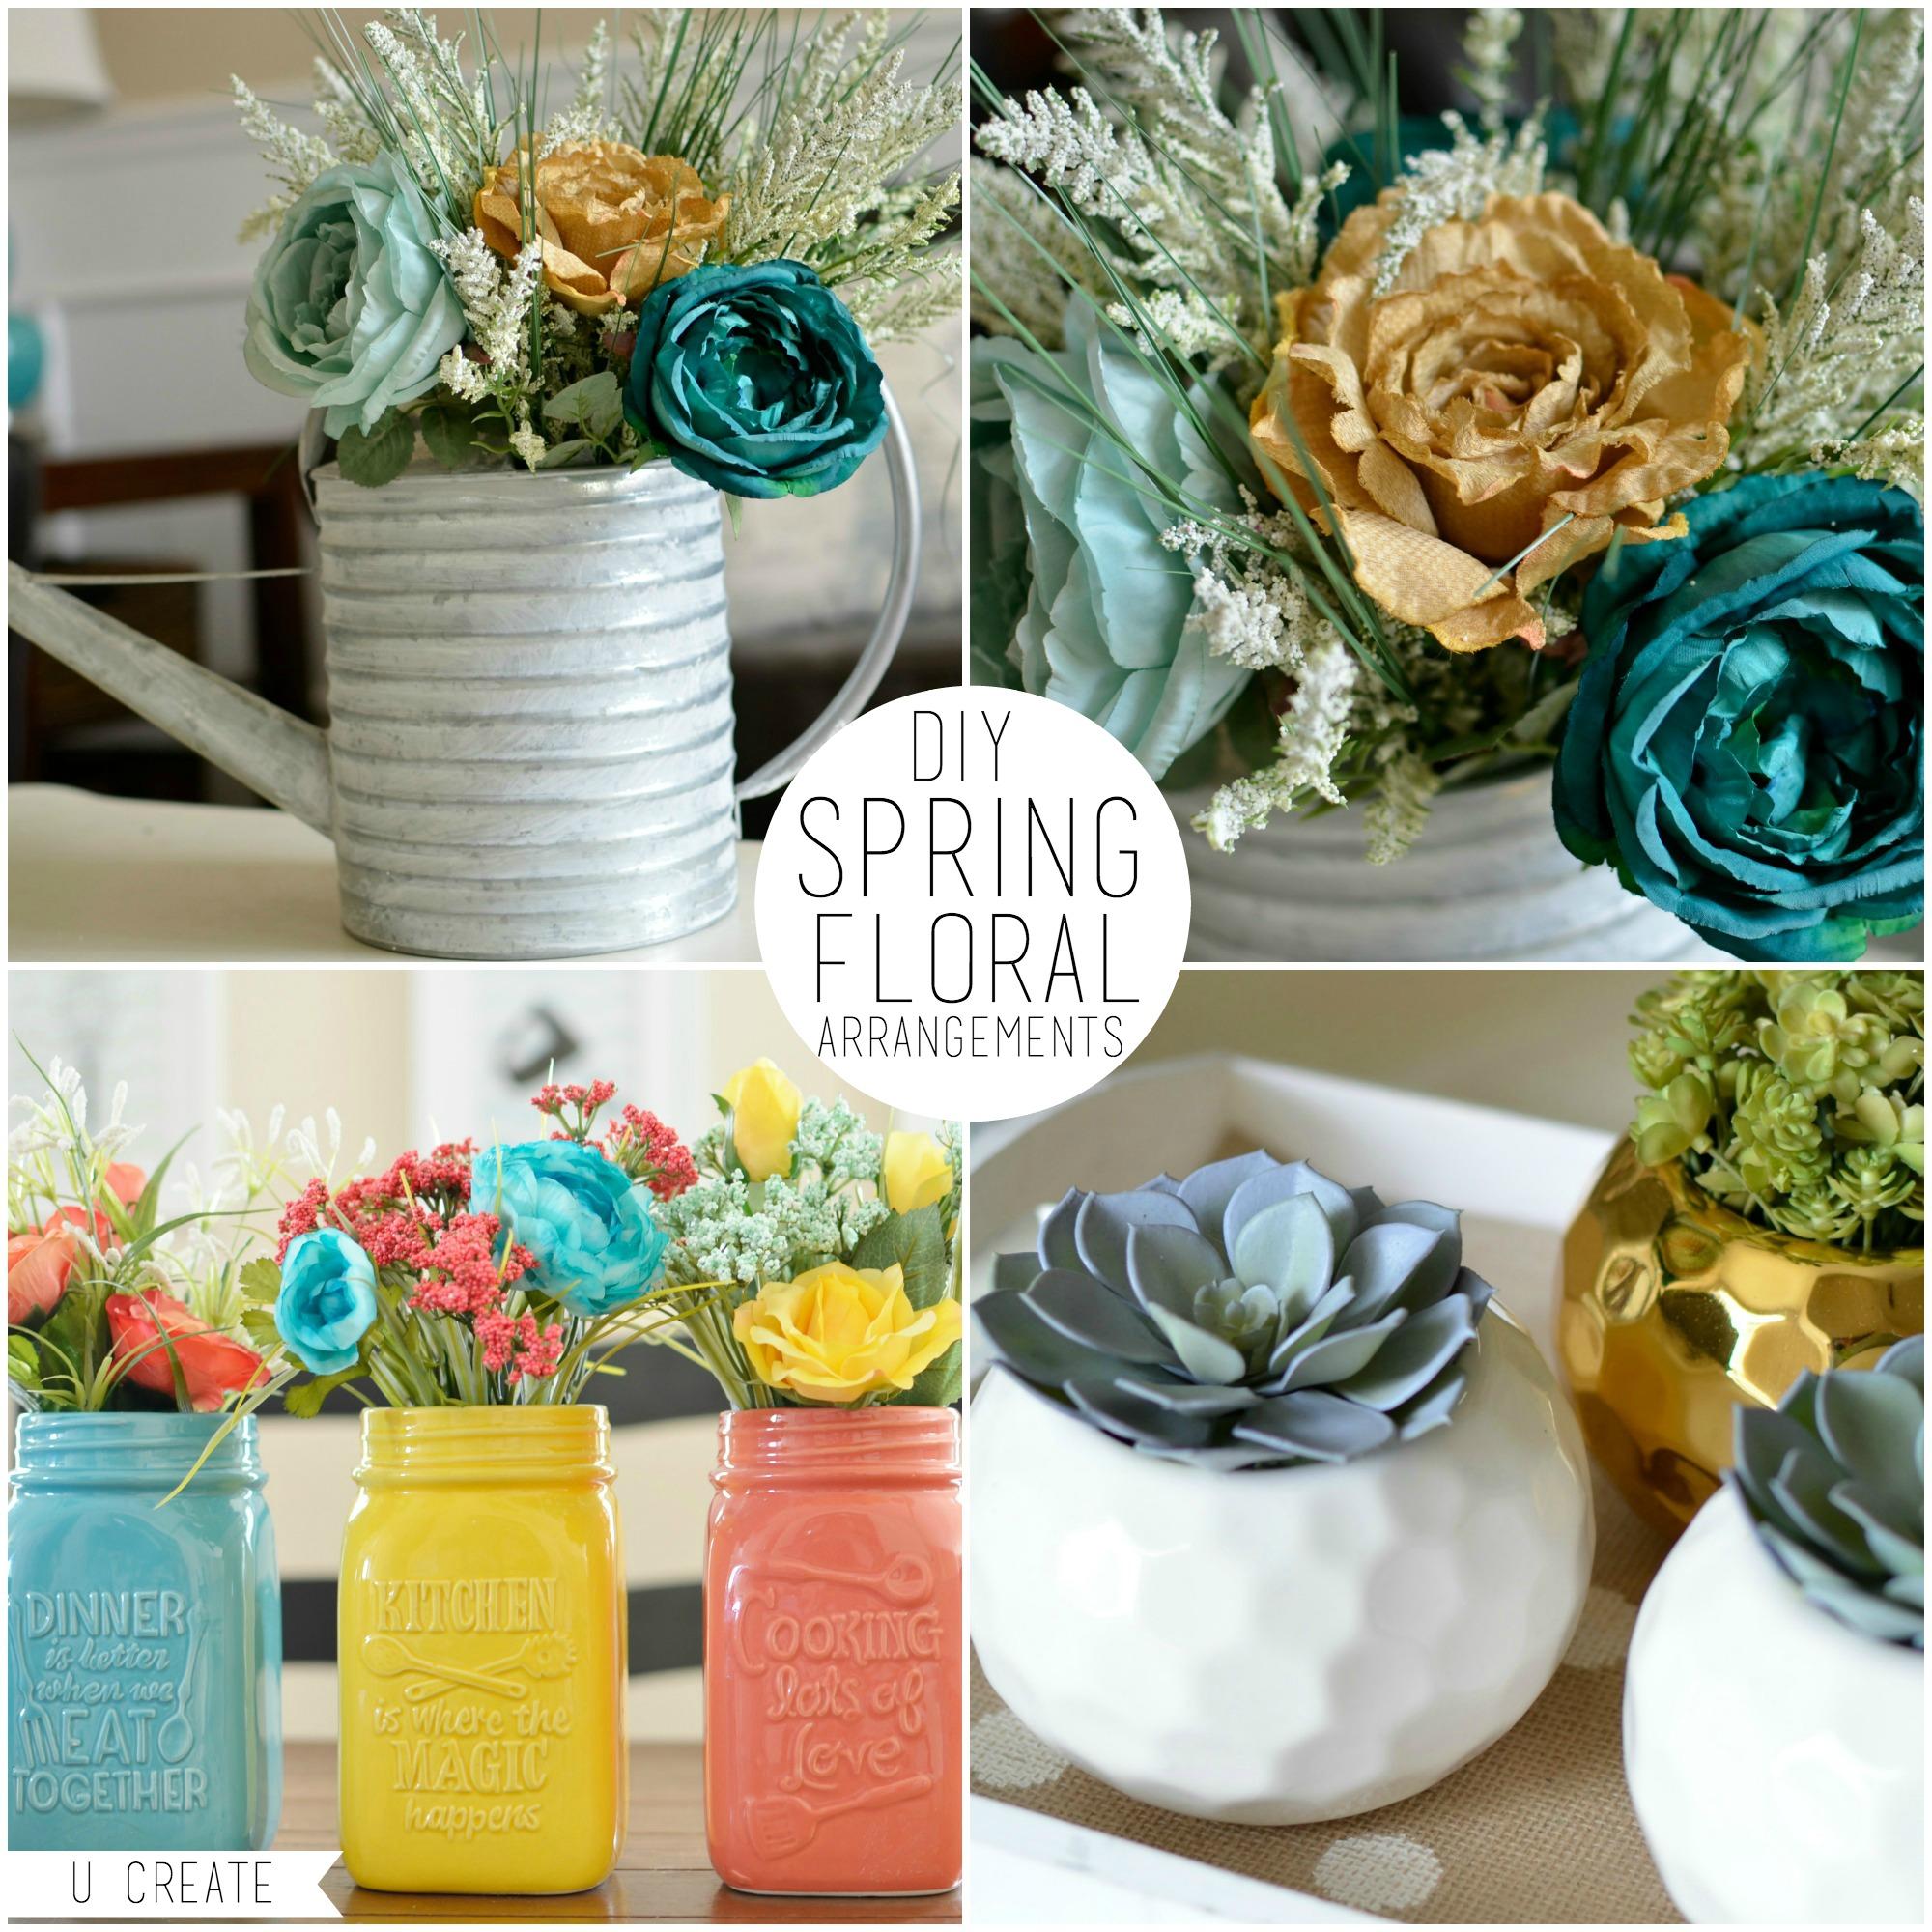 DIY Spring Floral Arrangements U Create